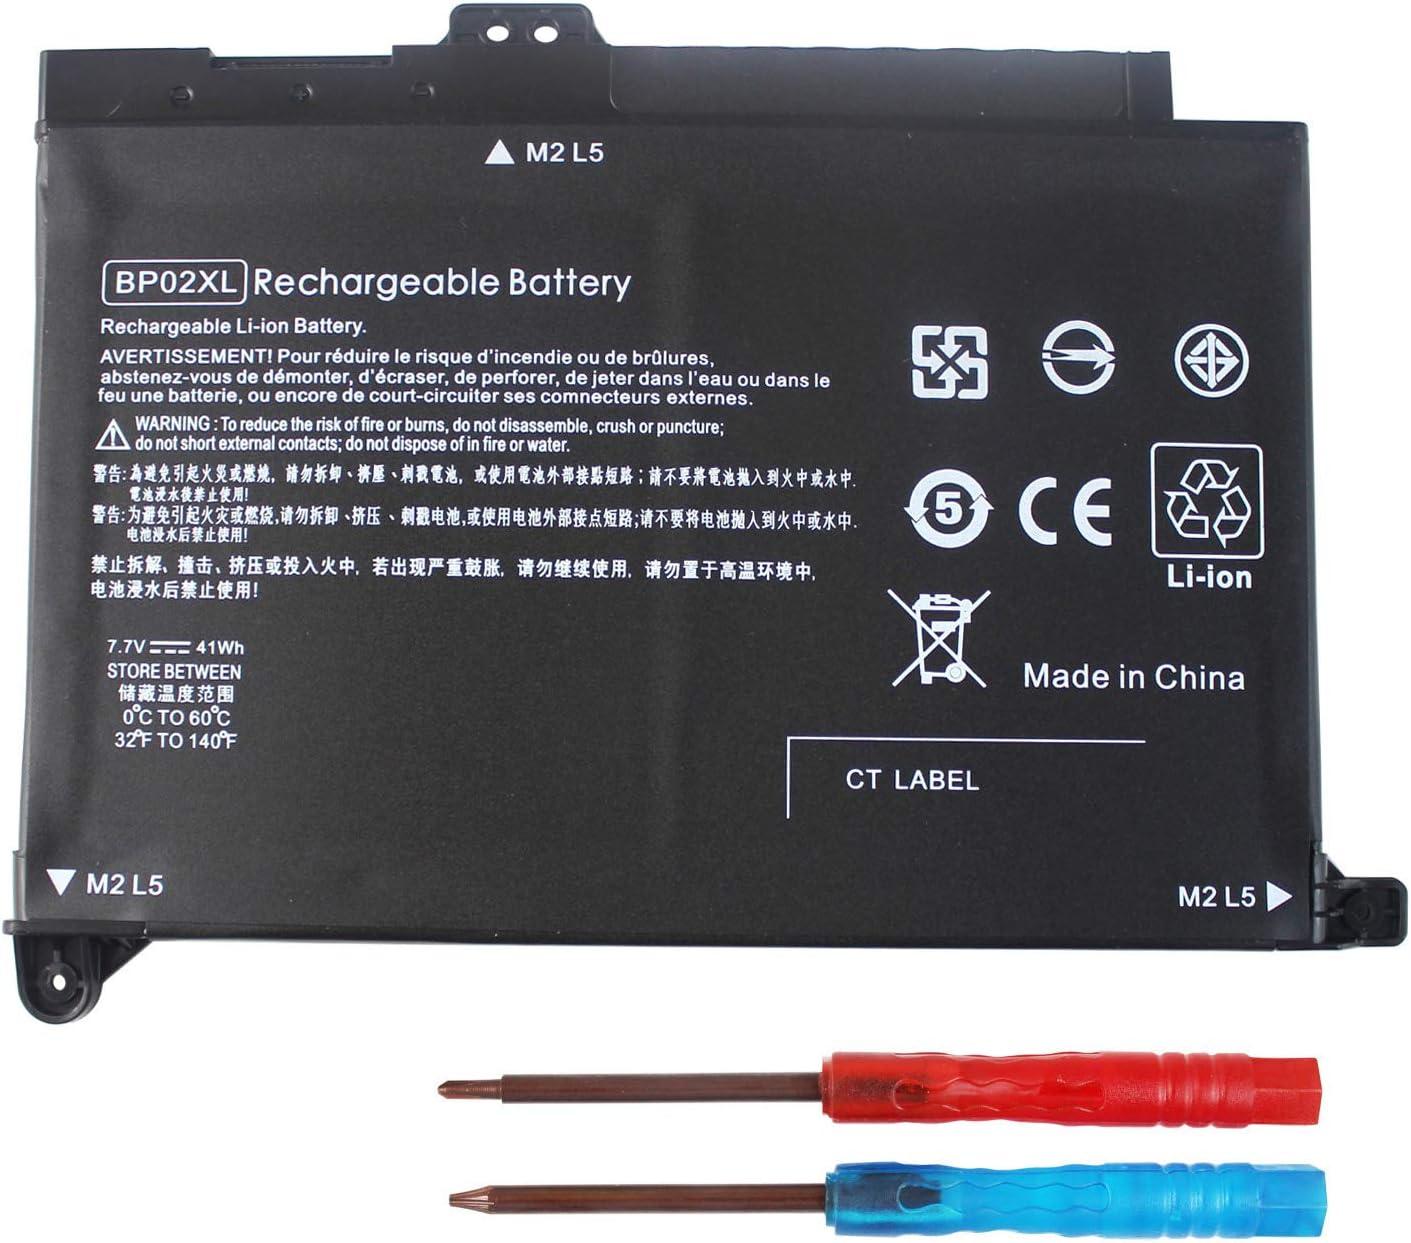 BPO2XL BP02XL 849909-850 Battery Replacement for HP Pavilion Notebook PC 15 Series 15-AU000 15-AW000 15T-AW000 15-AU018WM 15Z-AW000 Series 15-AU063CL 15-AU091NR 15-AU010WM 849569-421 849909-855